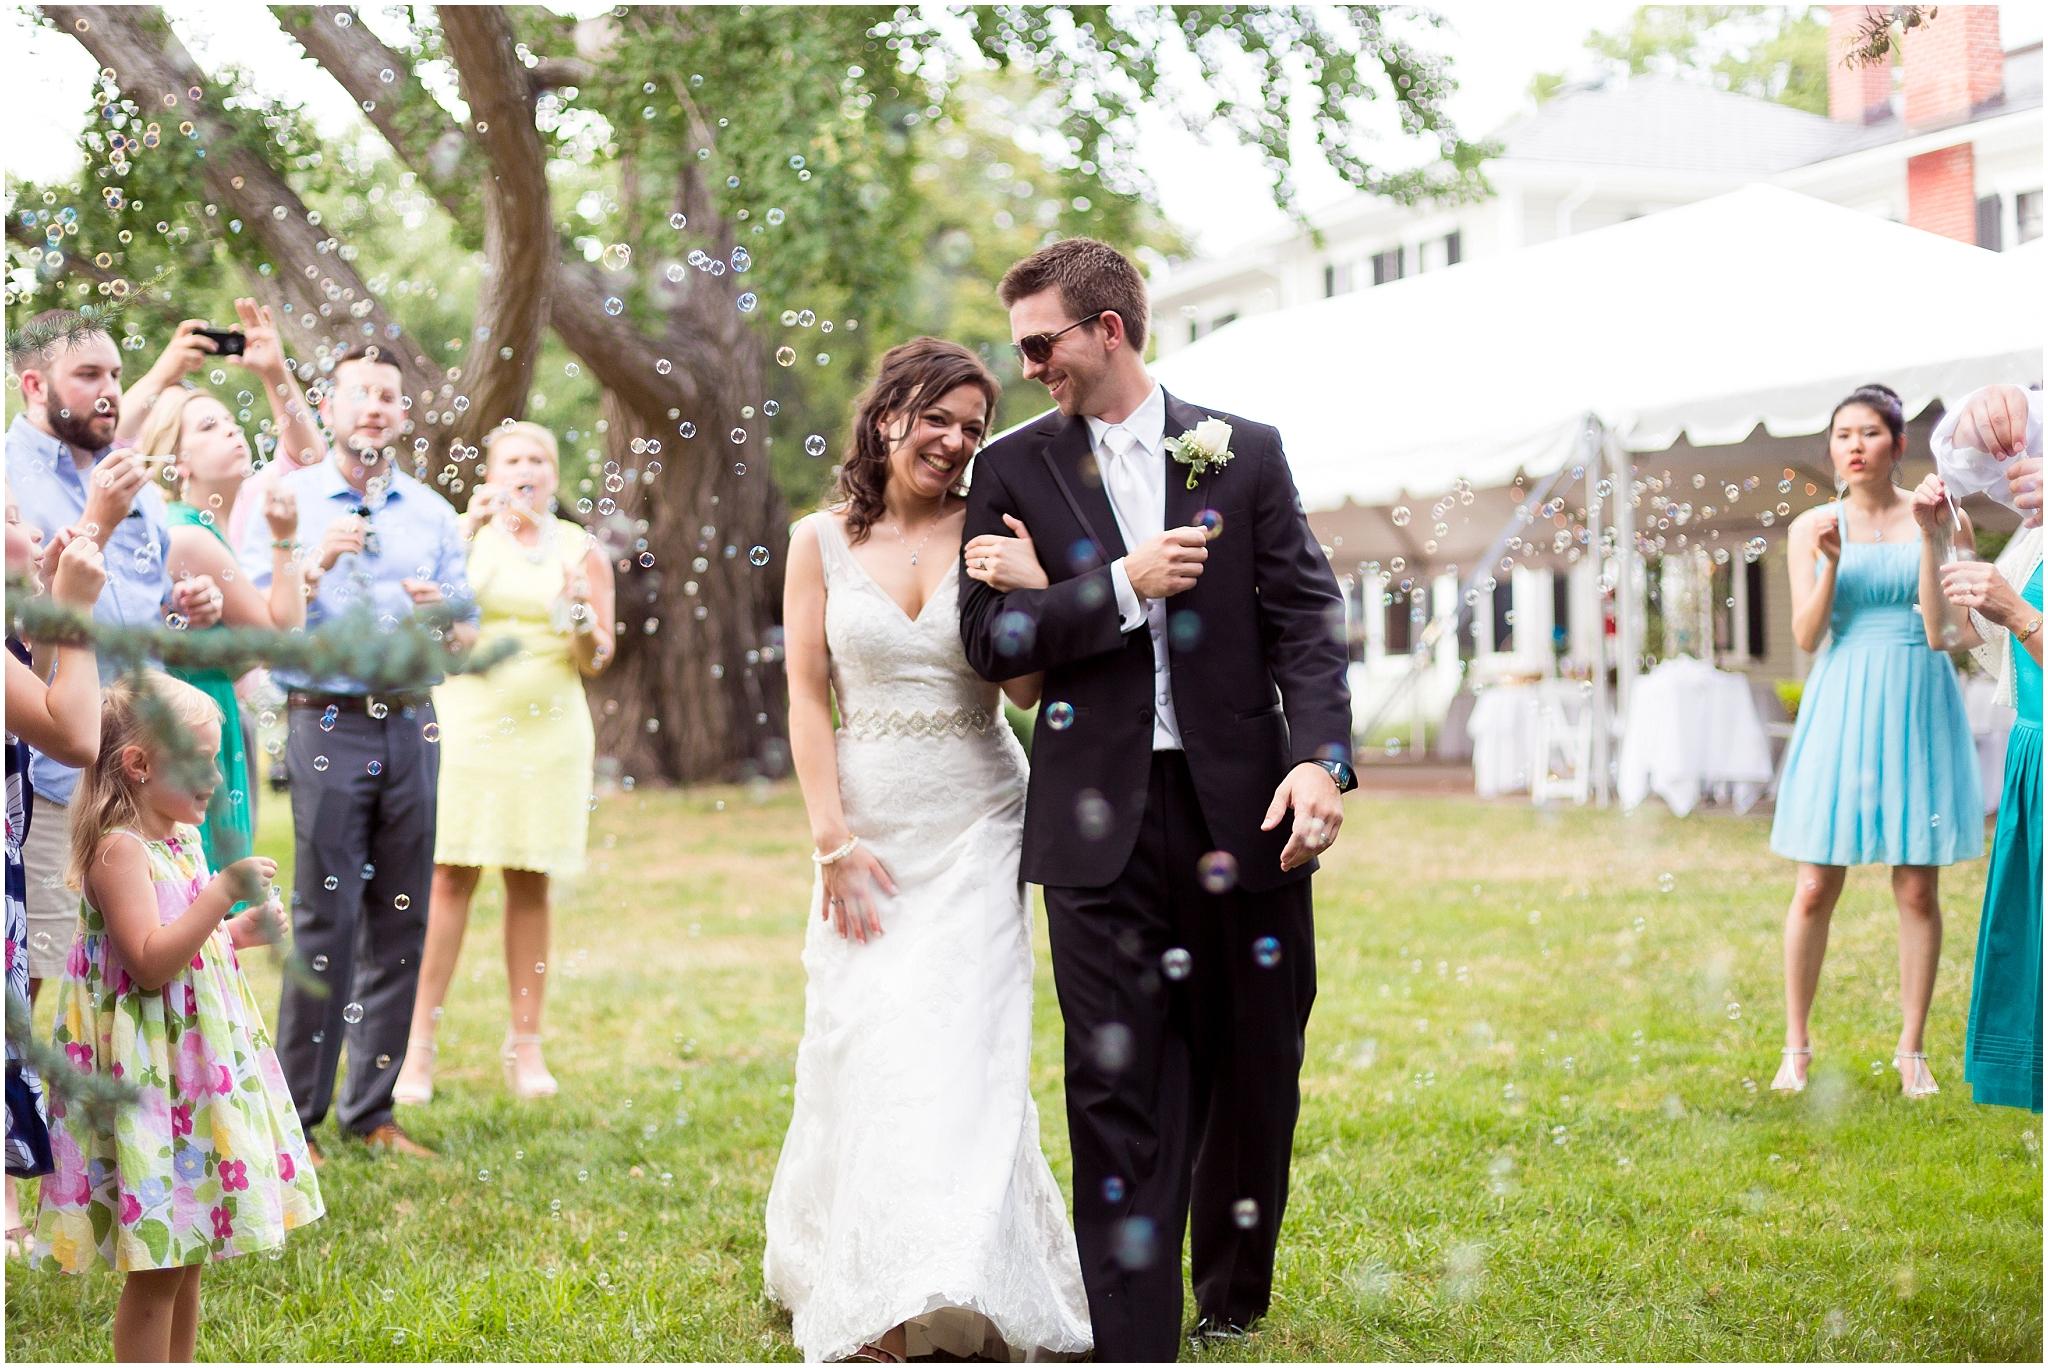 Tiffany Heidenthal - Outdoor Wedding Photography_0109.jpg